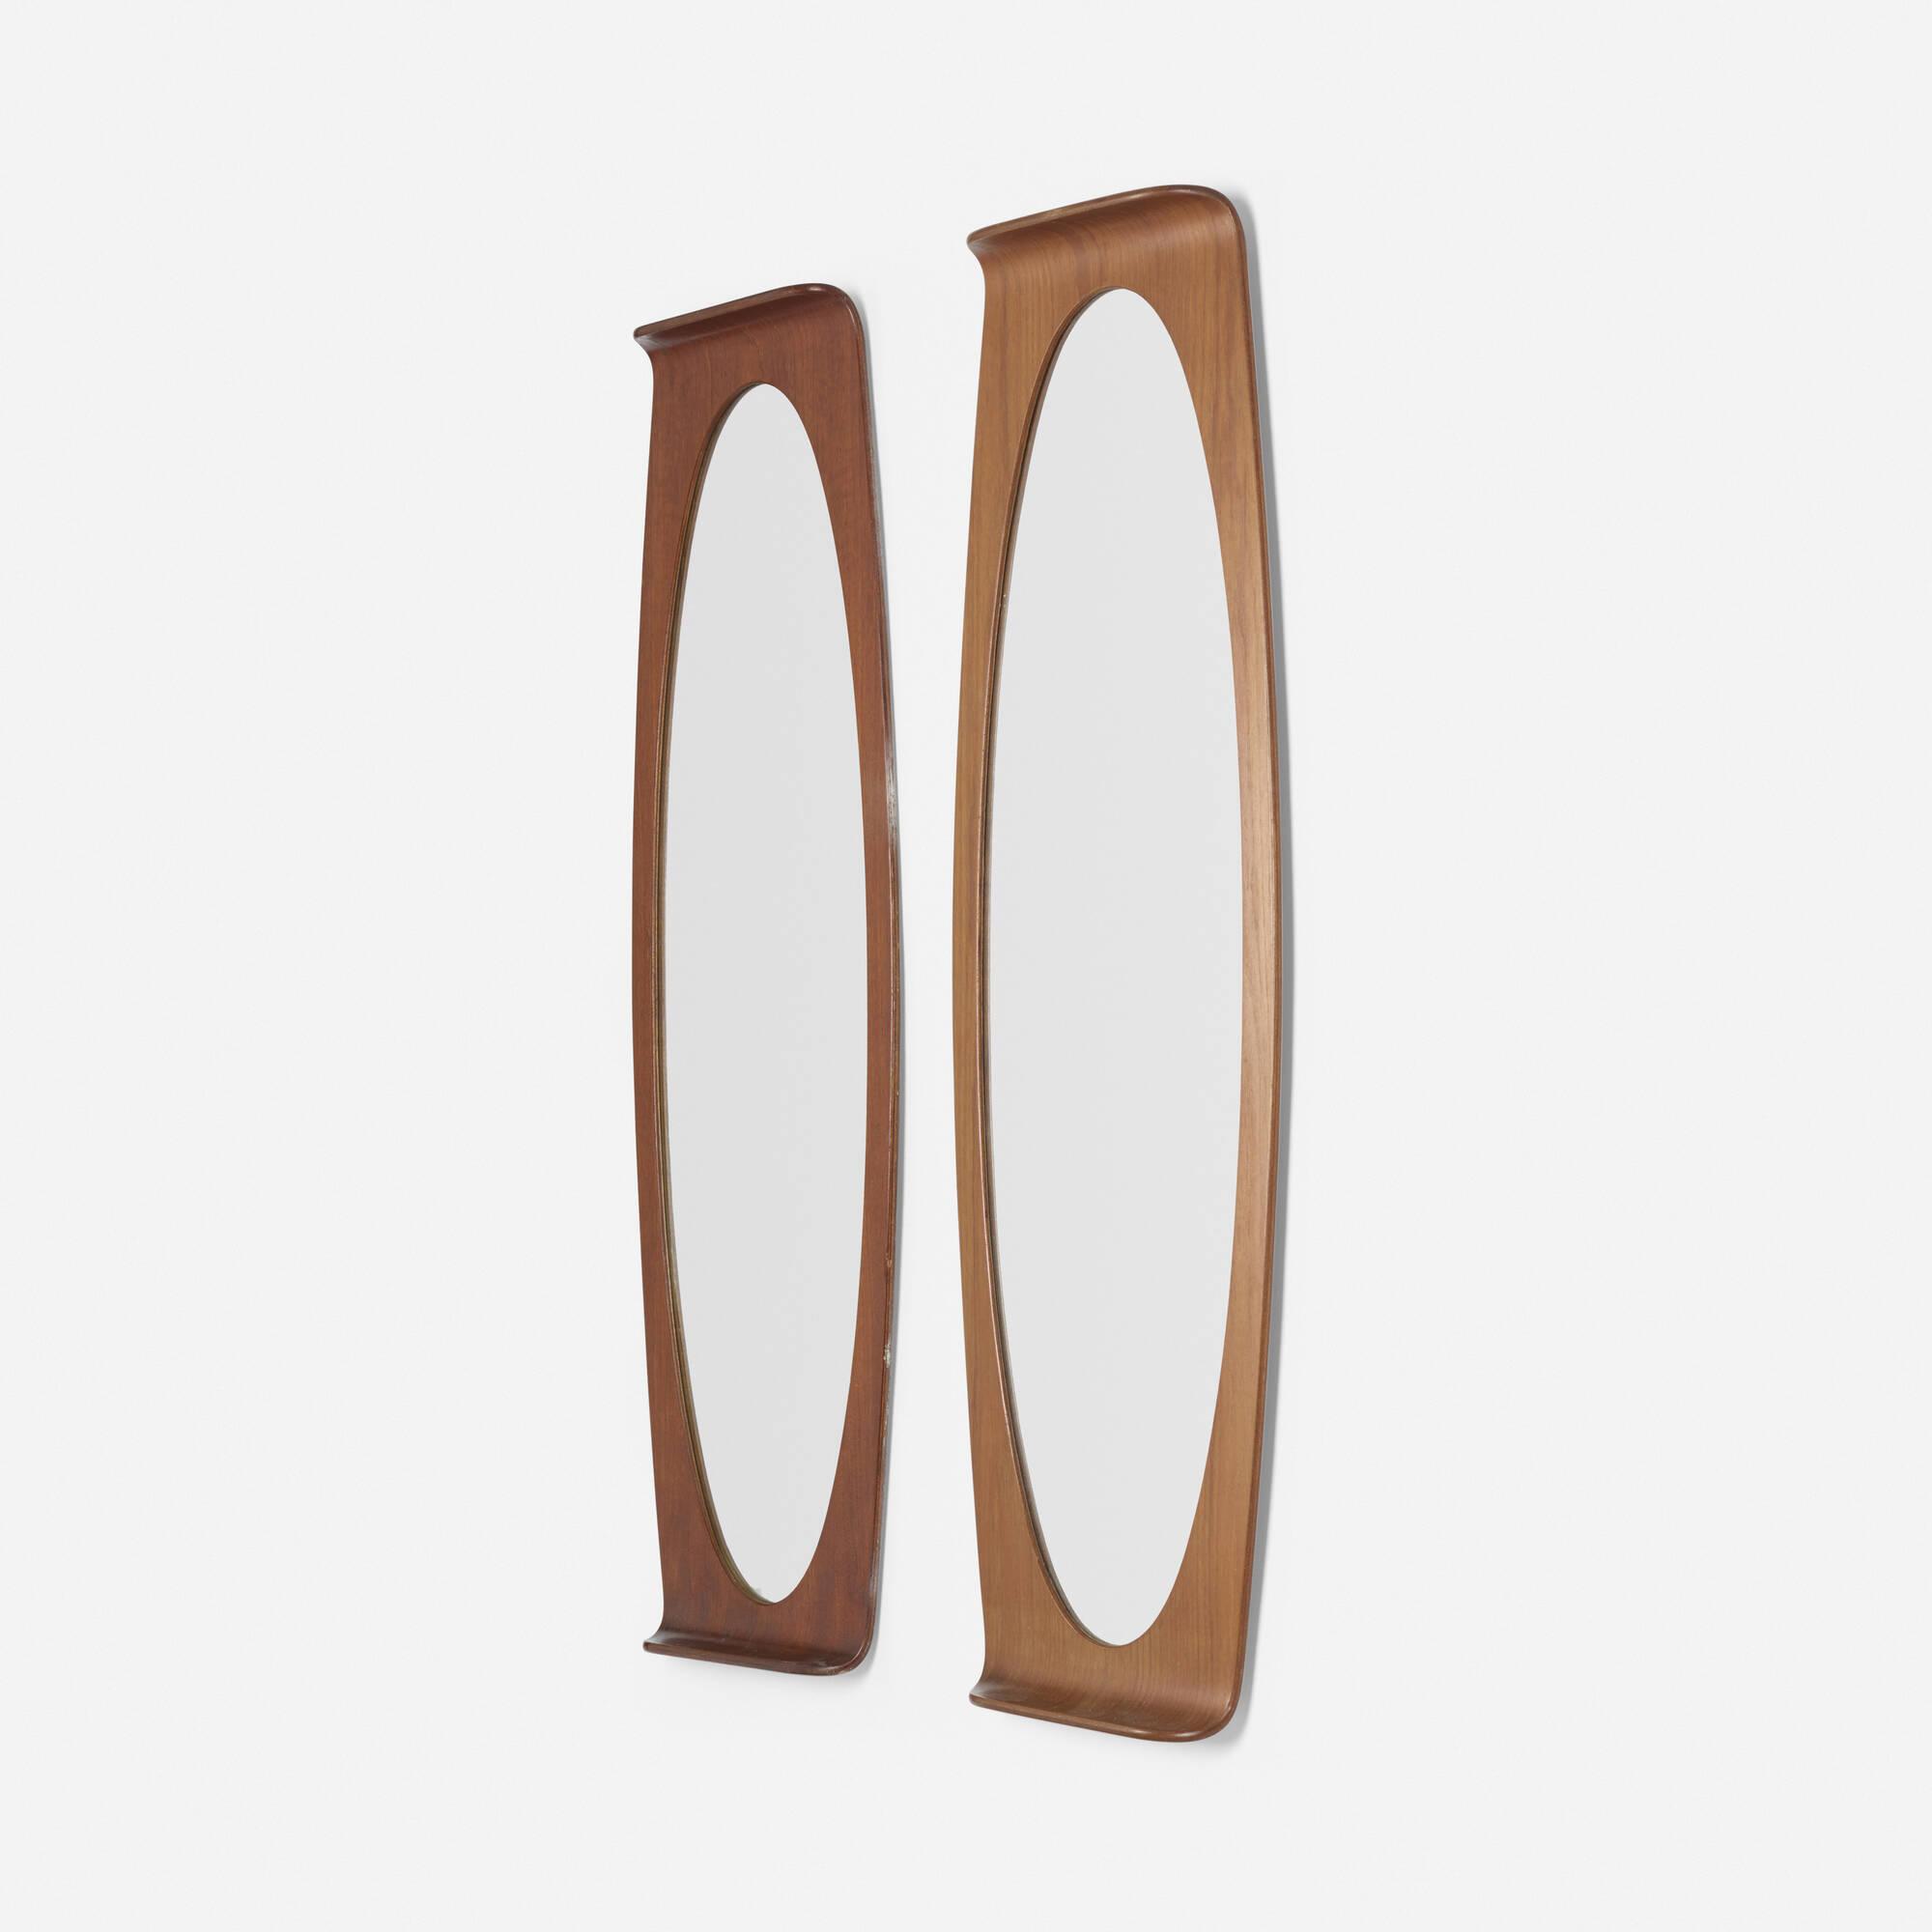 231: Franco Campo and Carlo Graffi / wall mirrors, pair (2 of 2)